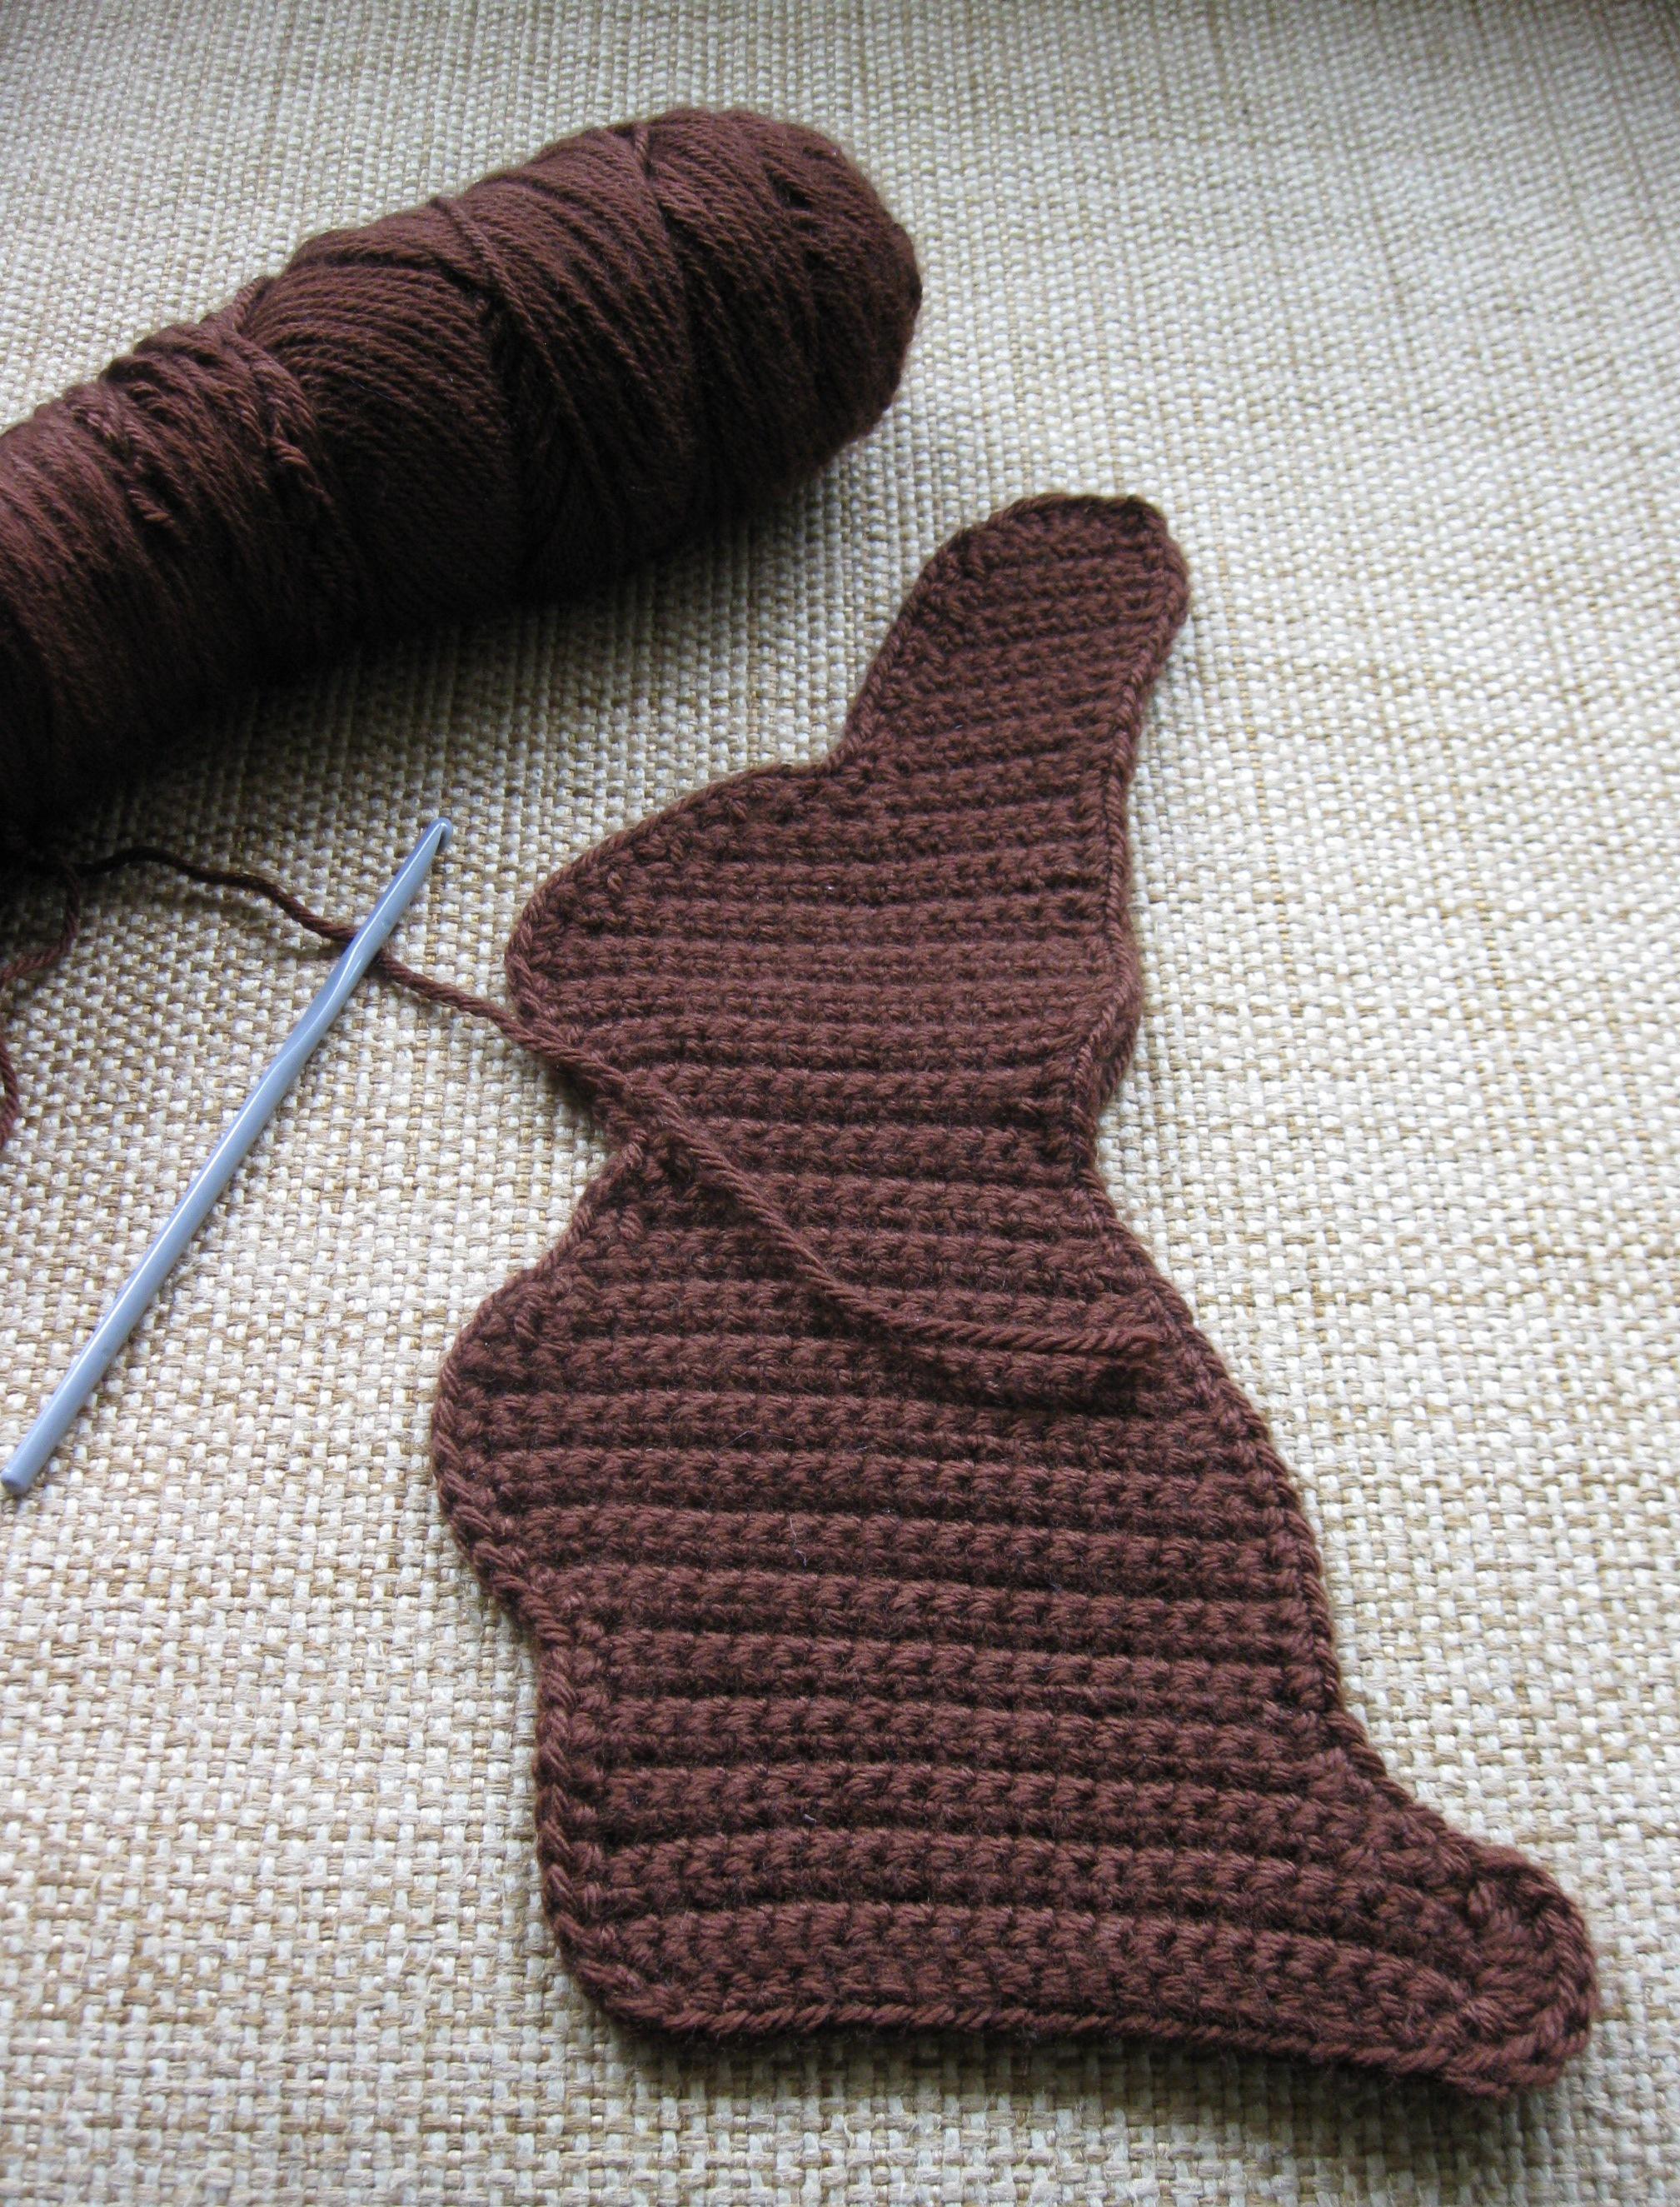 Chocolate Easter Bunny Crochet Pattern Free Pakbit For